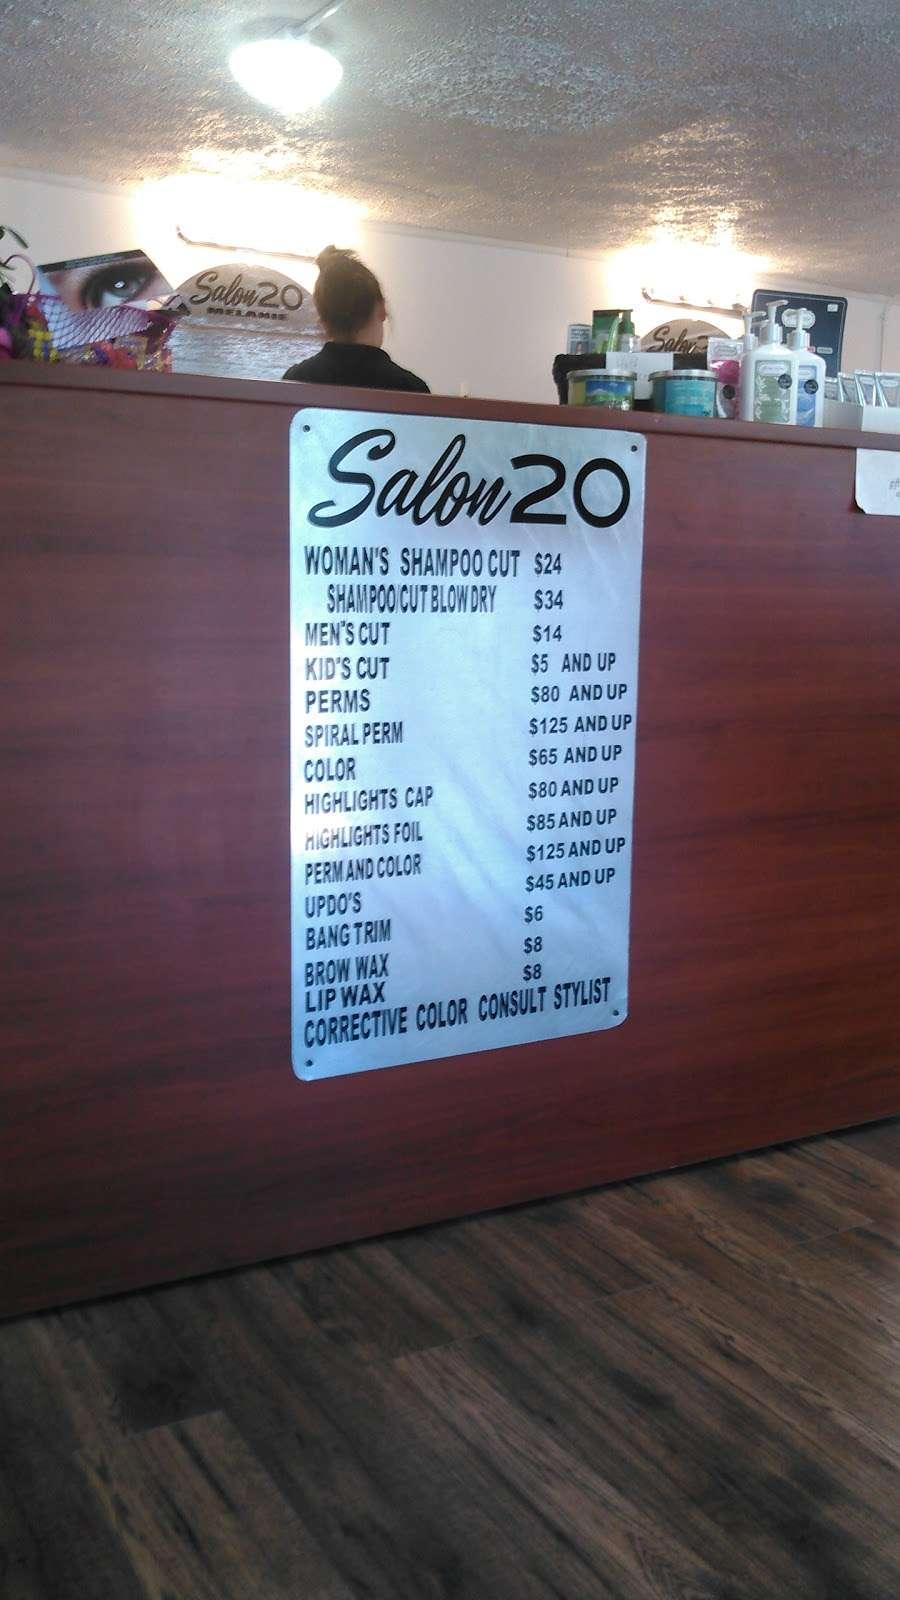 Salon 20 - hair care  | Photo 1 of 1 | Address: 34477 Constitution Hwy, Locust Grove, VA 22508, USA | Phone: (540) 621-3258